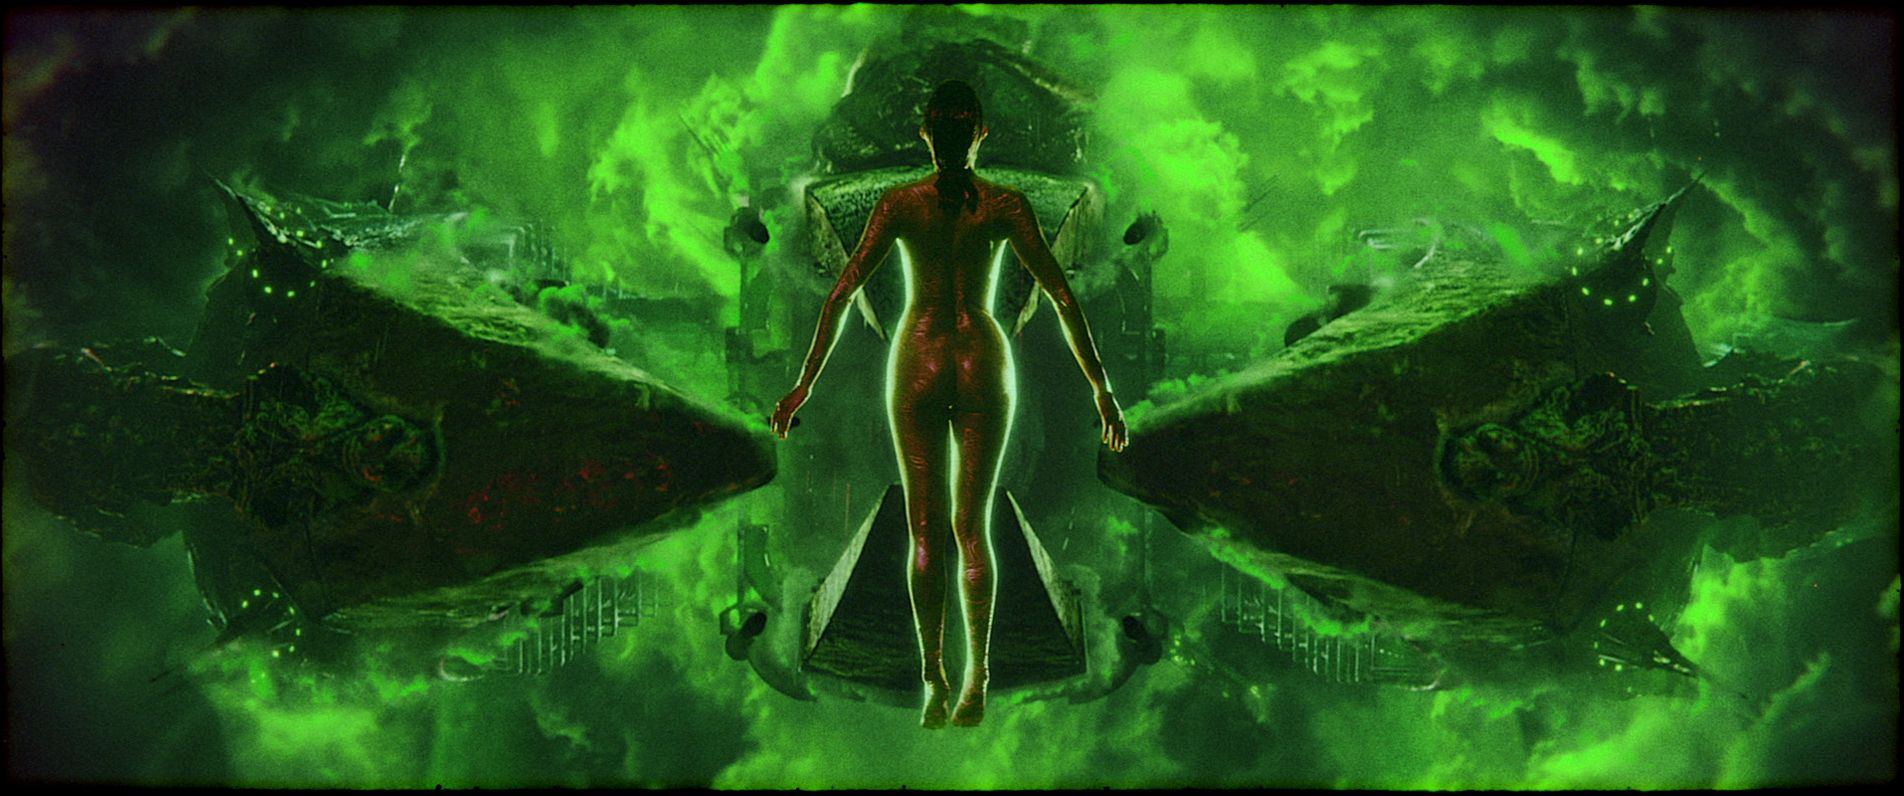 Exclusive 'Blood Machines' Trailer Reveals Shudder's Mind-Bending Sci-Fi Film